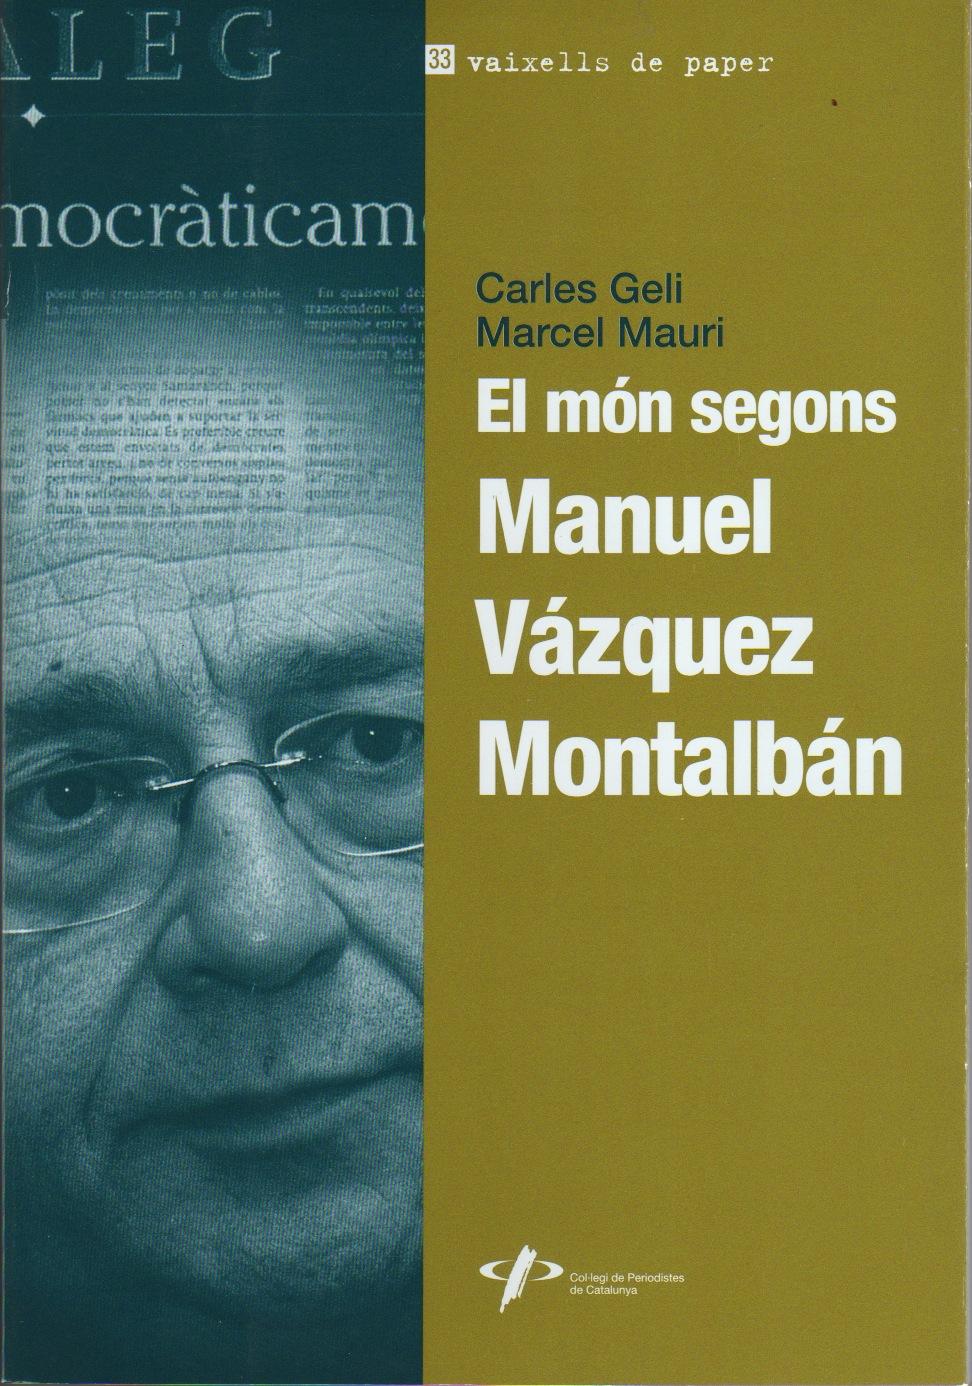 El món segons Manuel Vázquez Montalbán